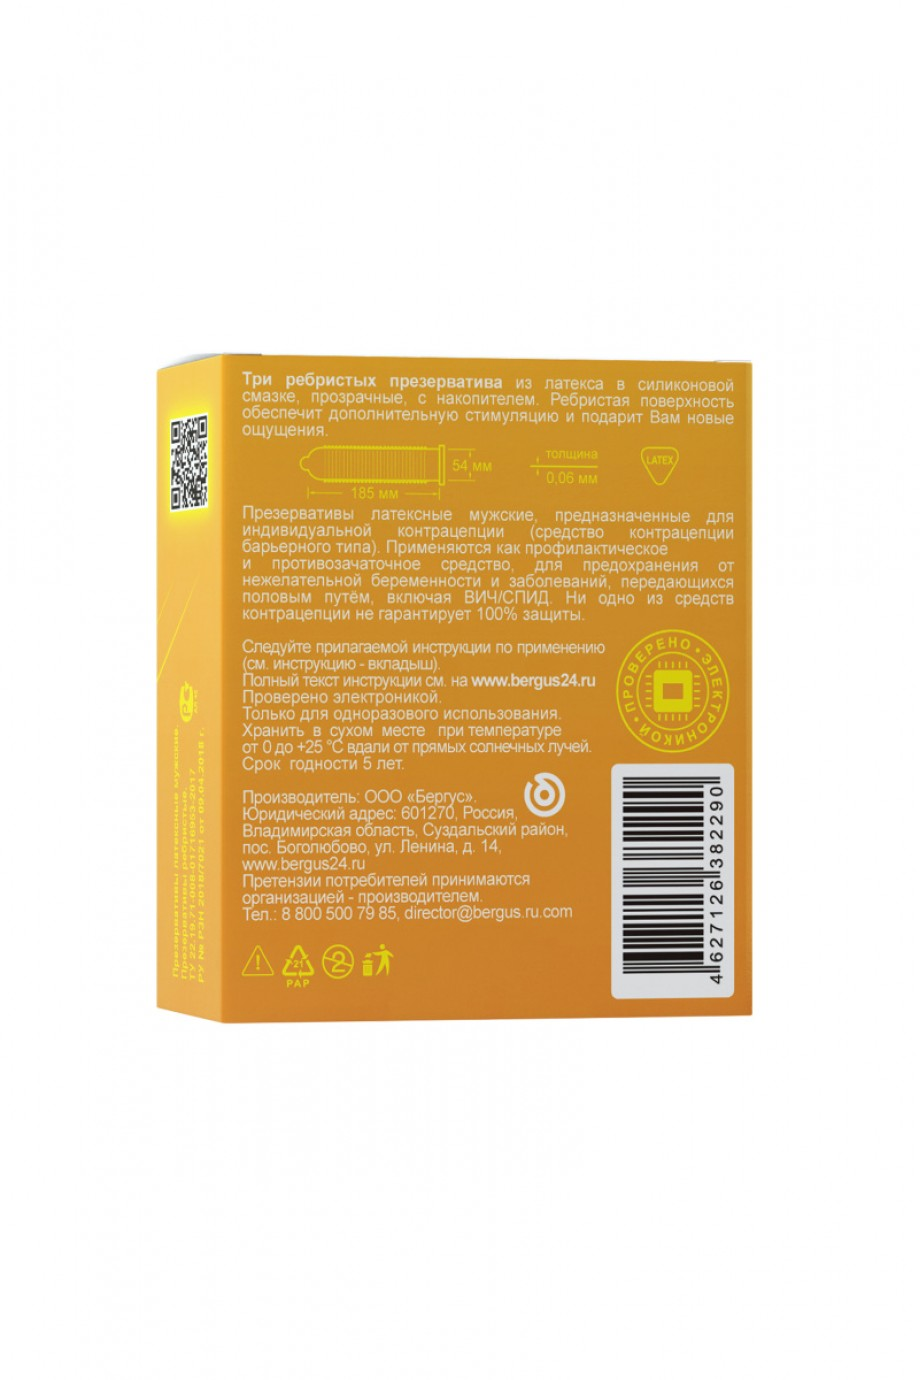 Презервативы TOREX ребристые, латекс, 3 шт